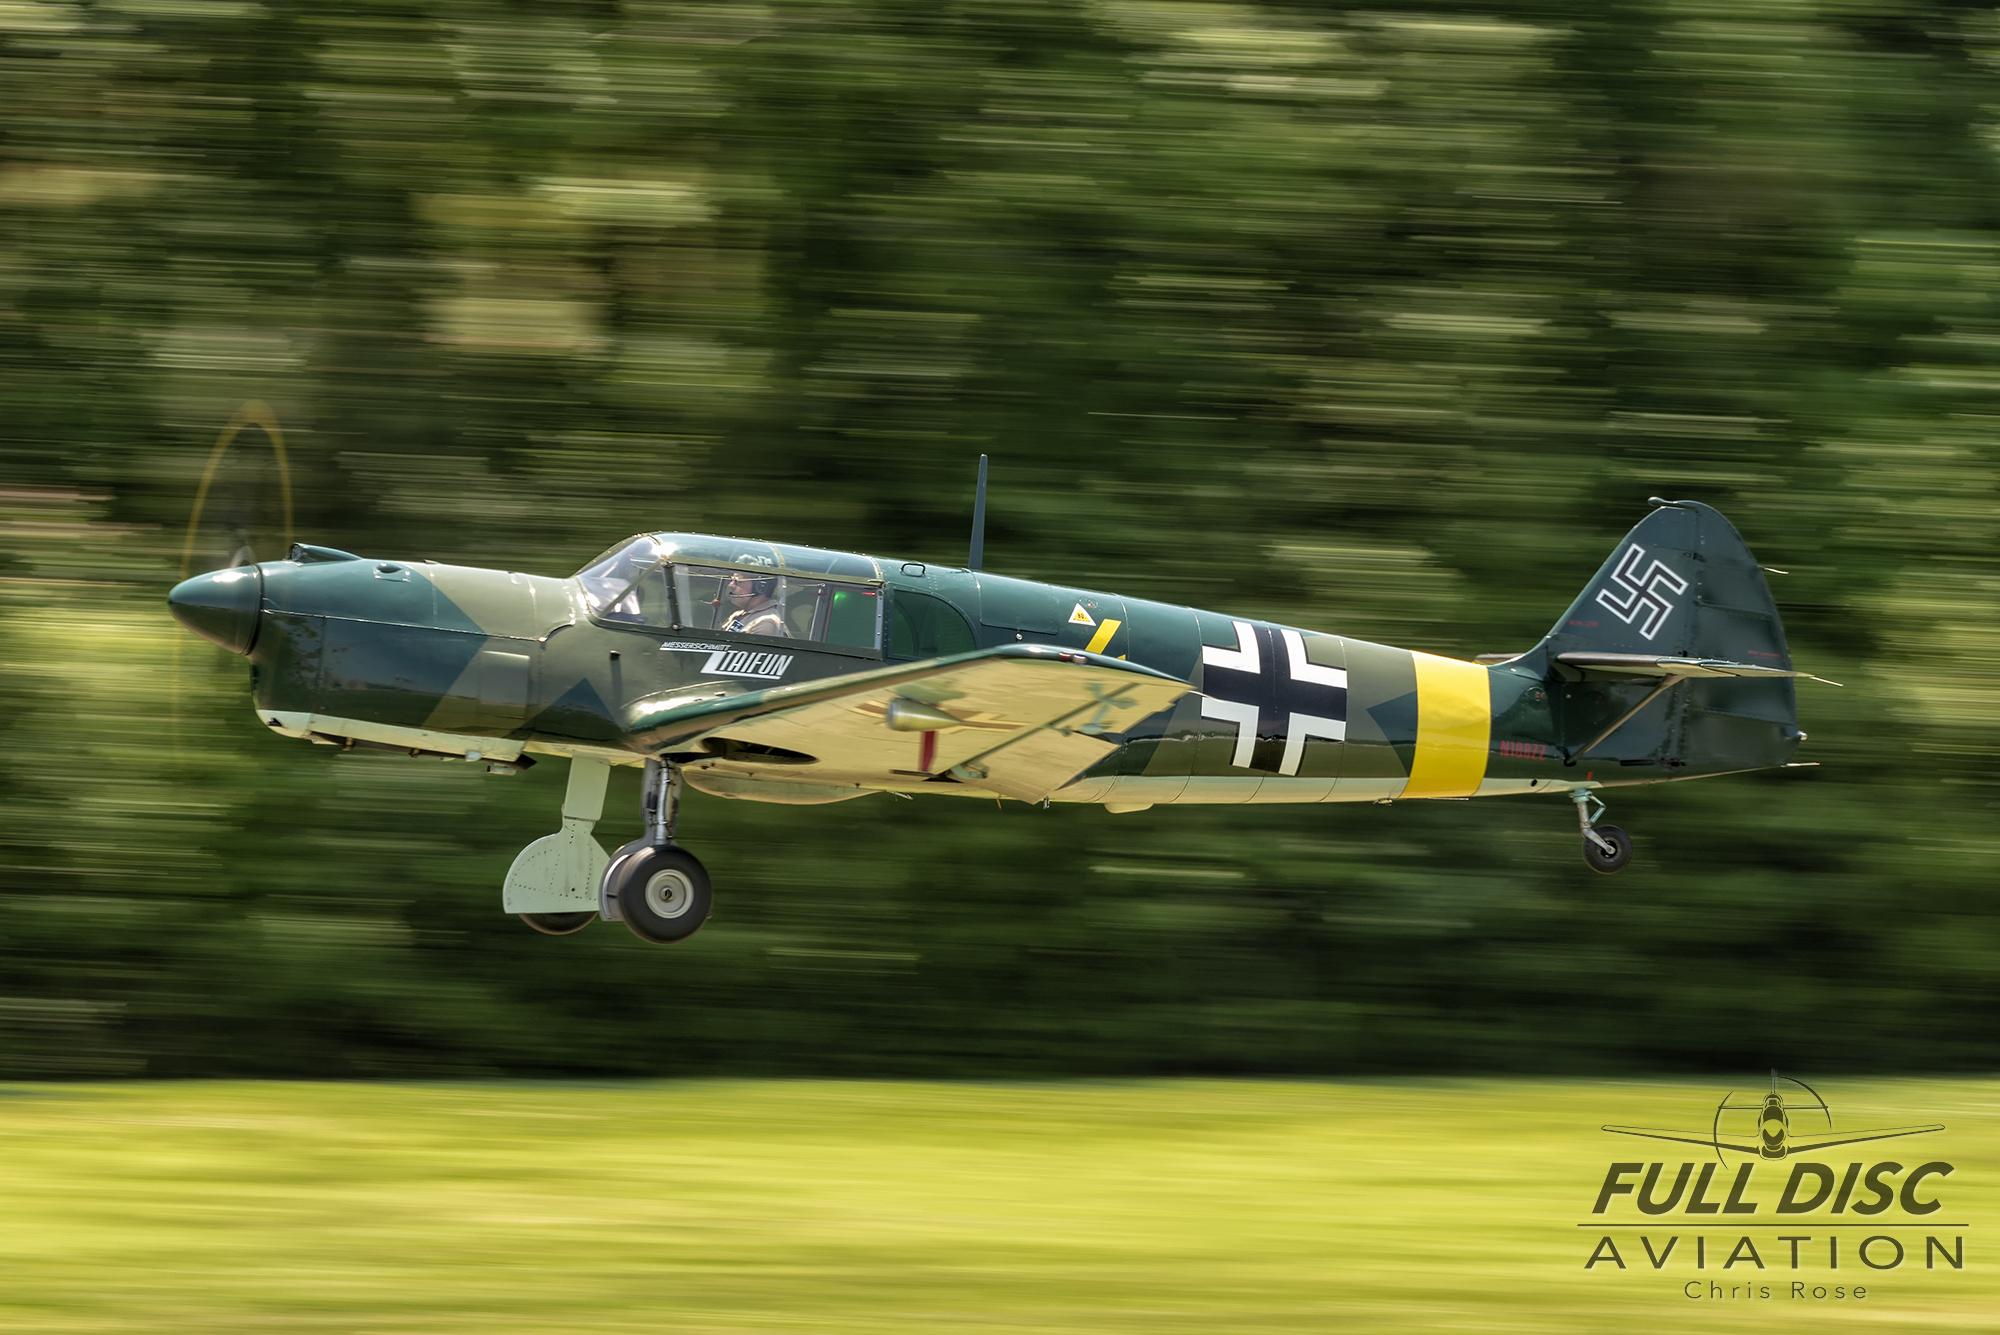 warbirdsoverthebeach_fulldiscaviation_chrisrose_bf108_2.jpg